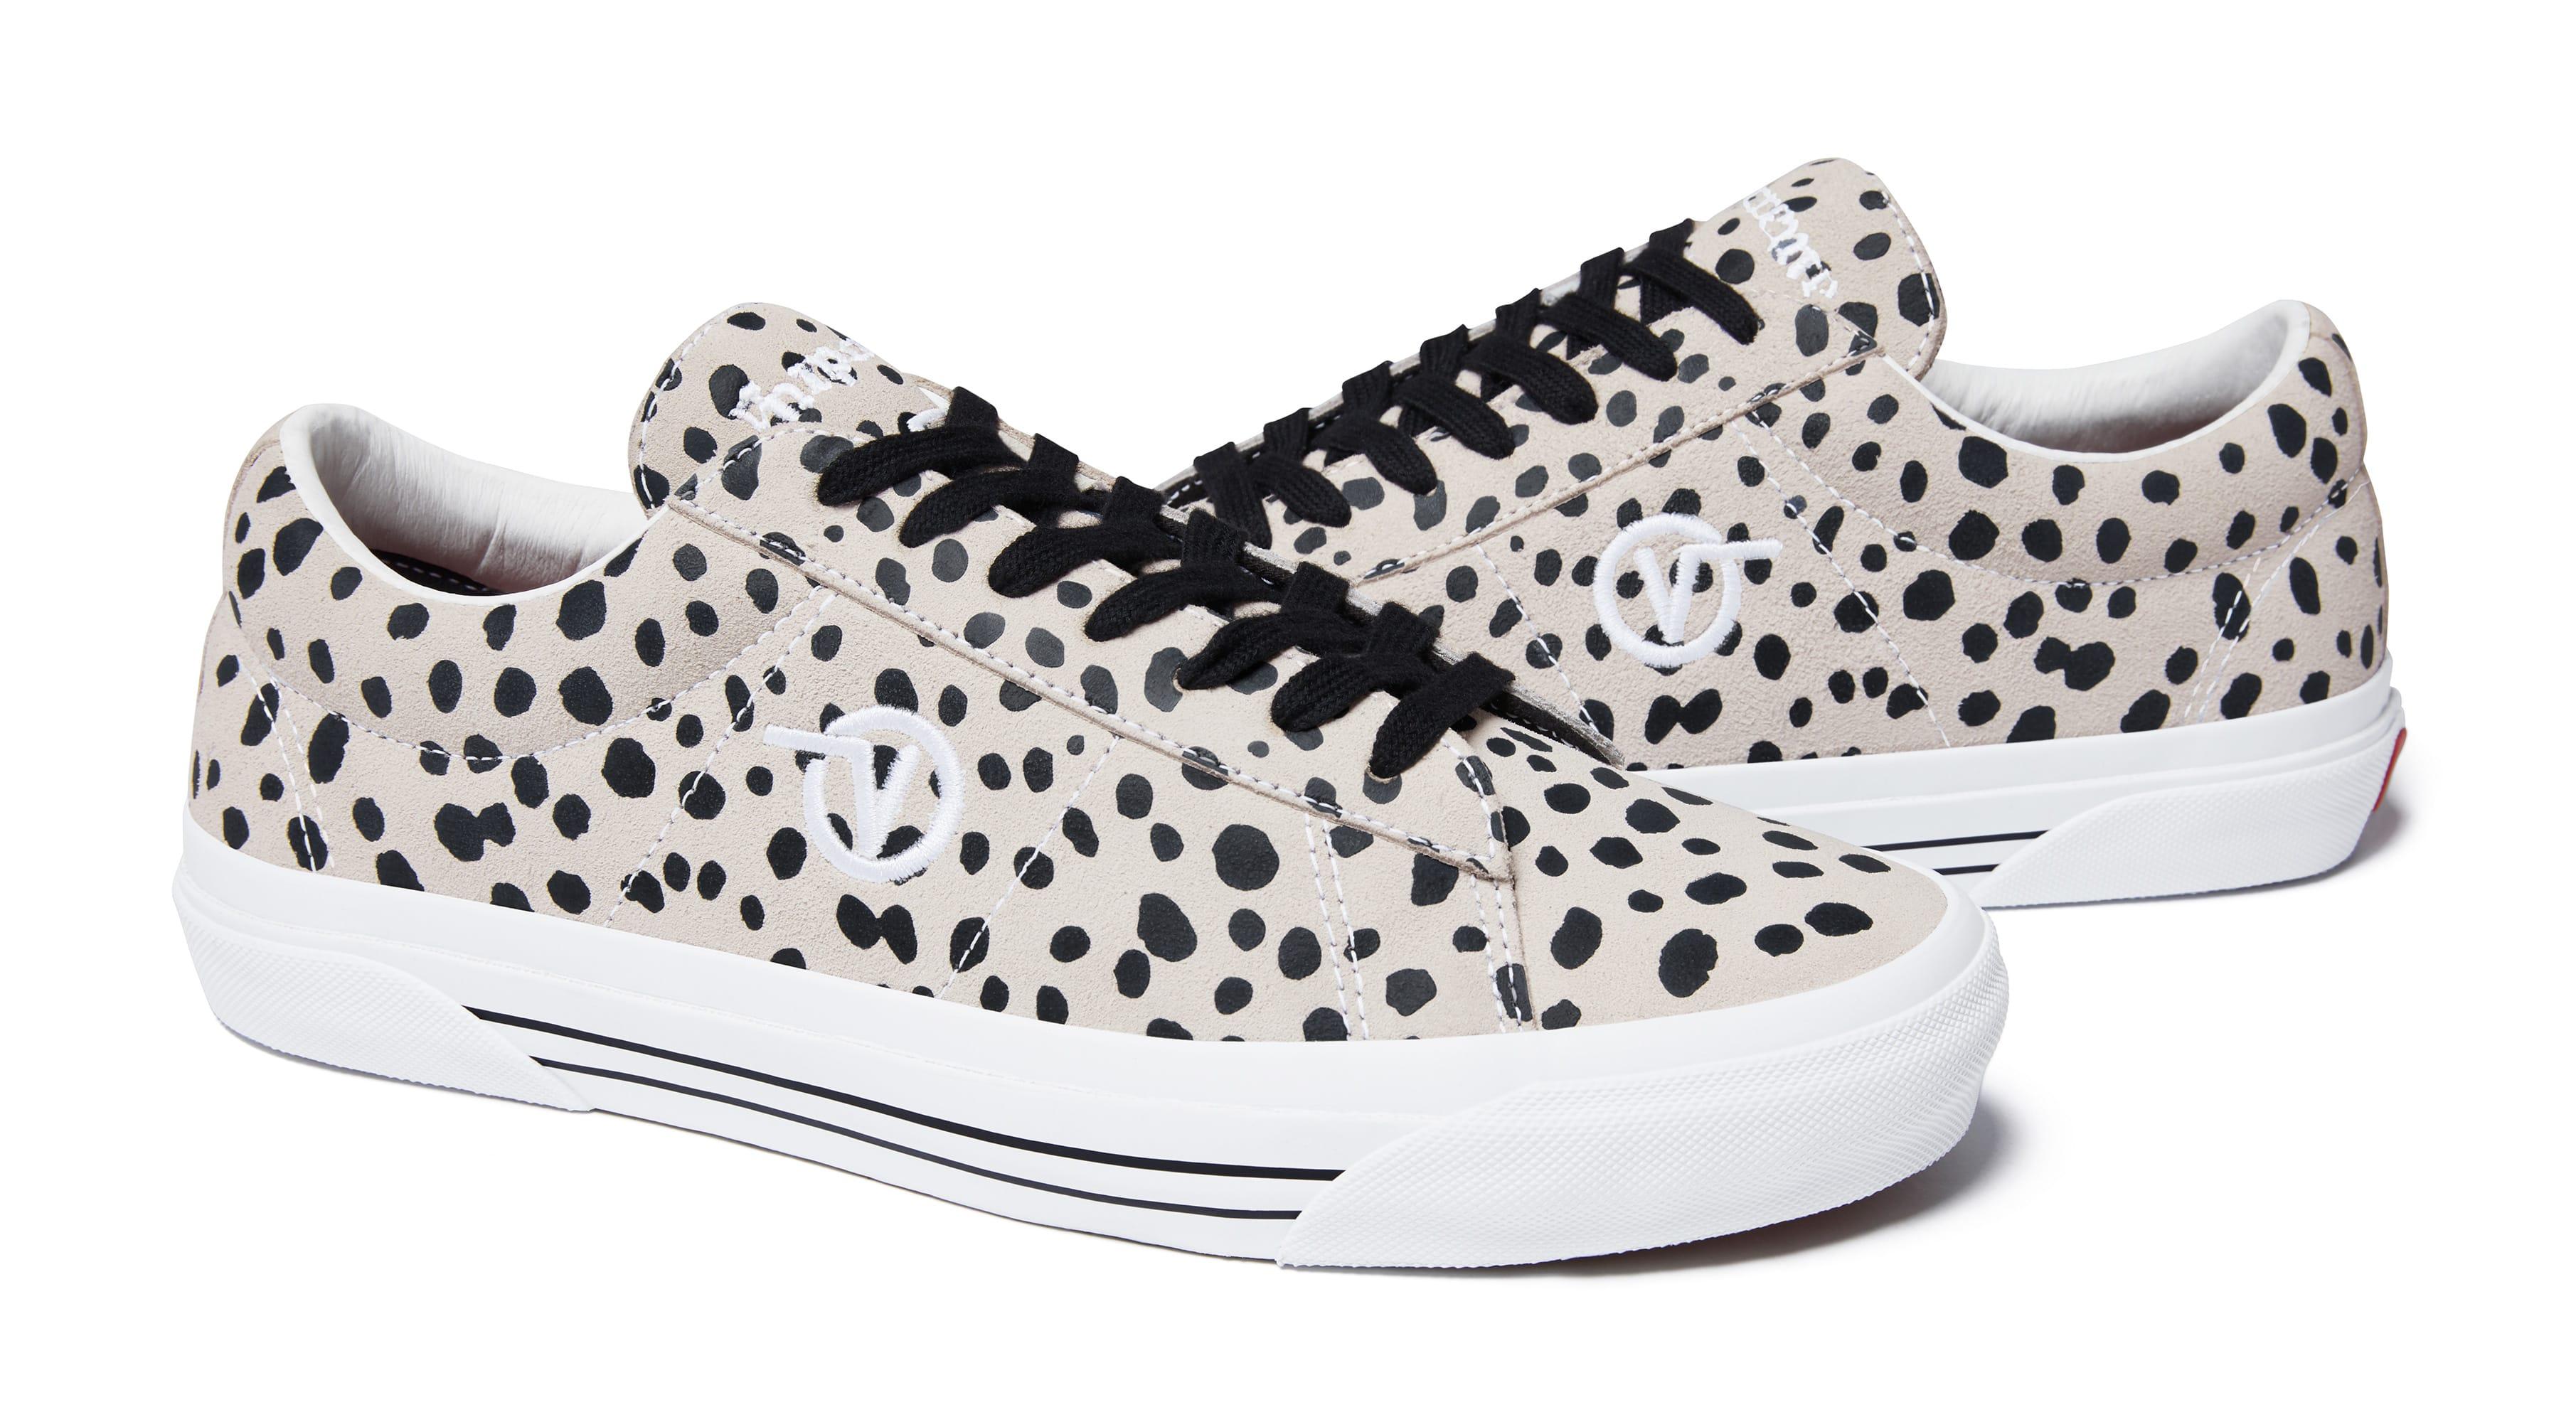 Supreme x Vans Sid Pro 'Dots'